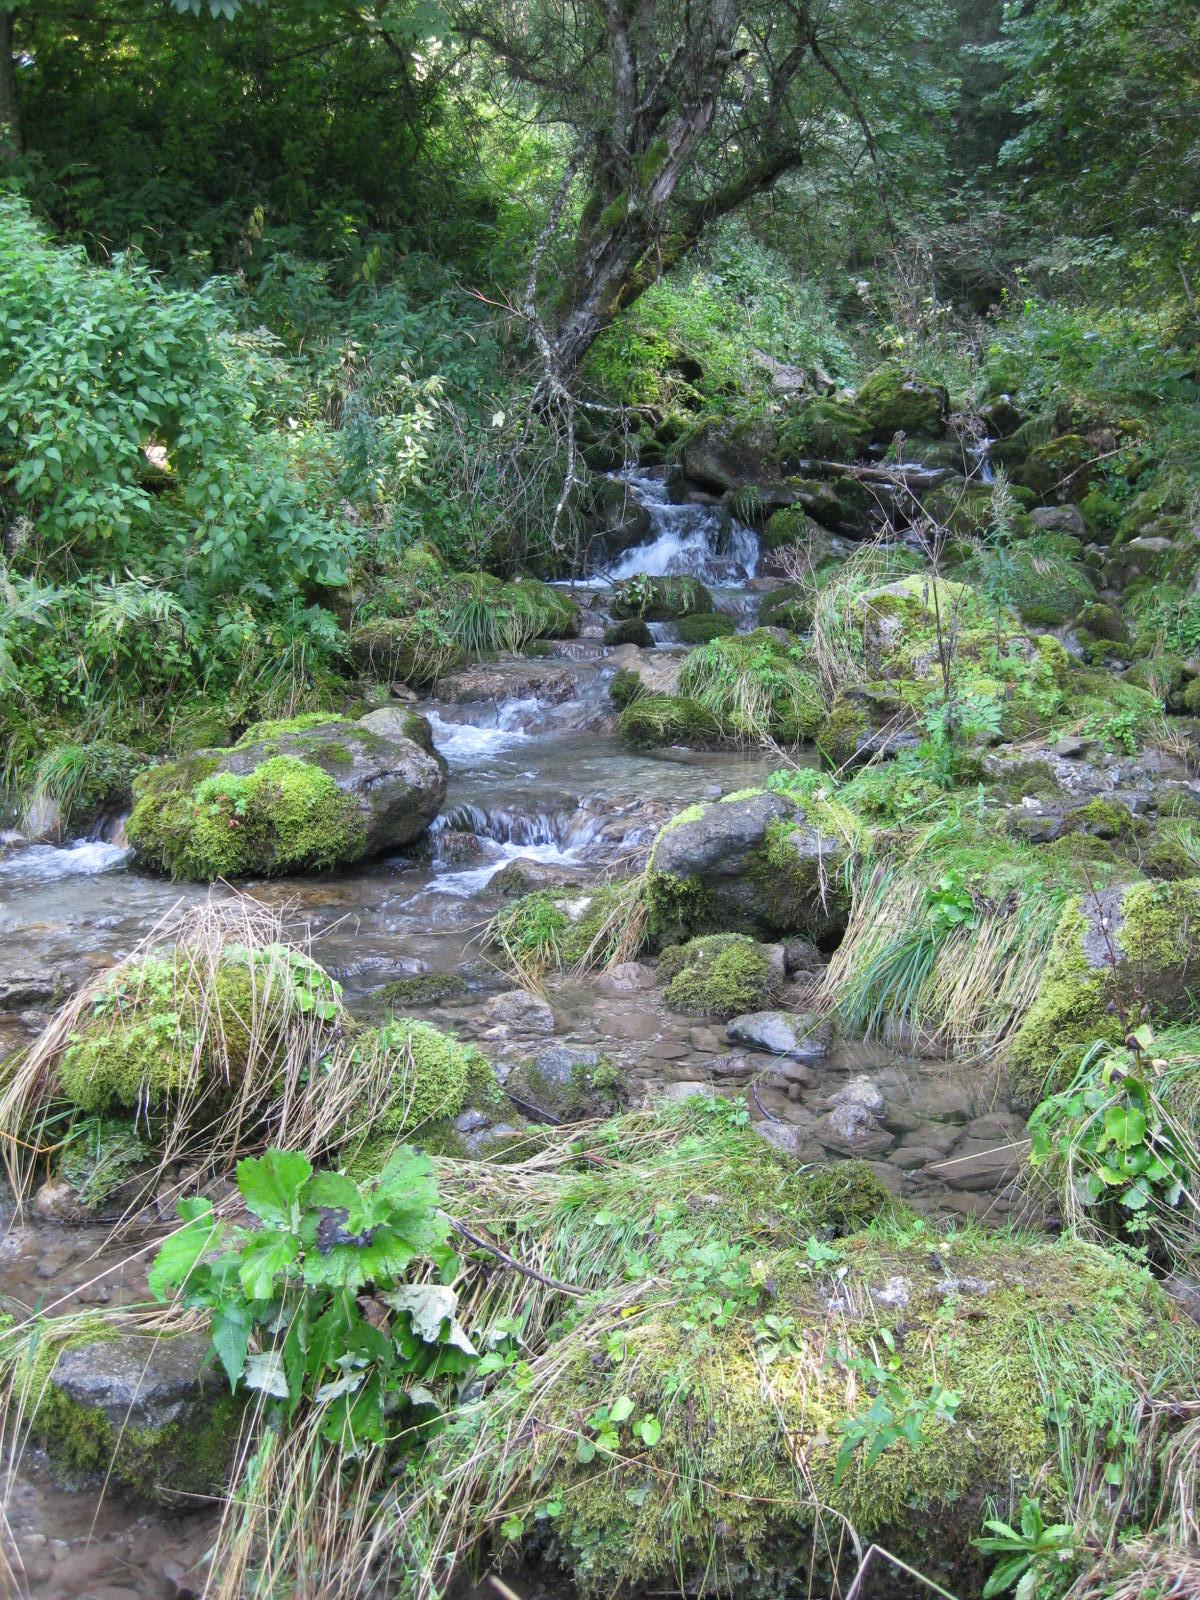 Ruisseau en forêt.